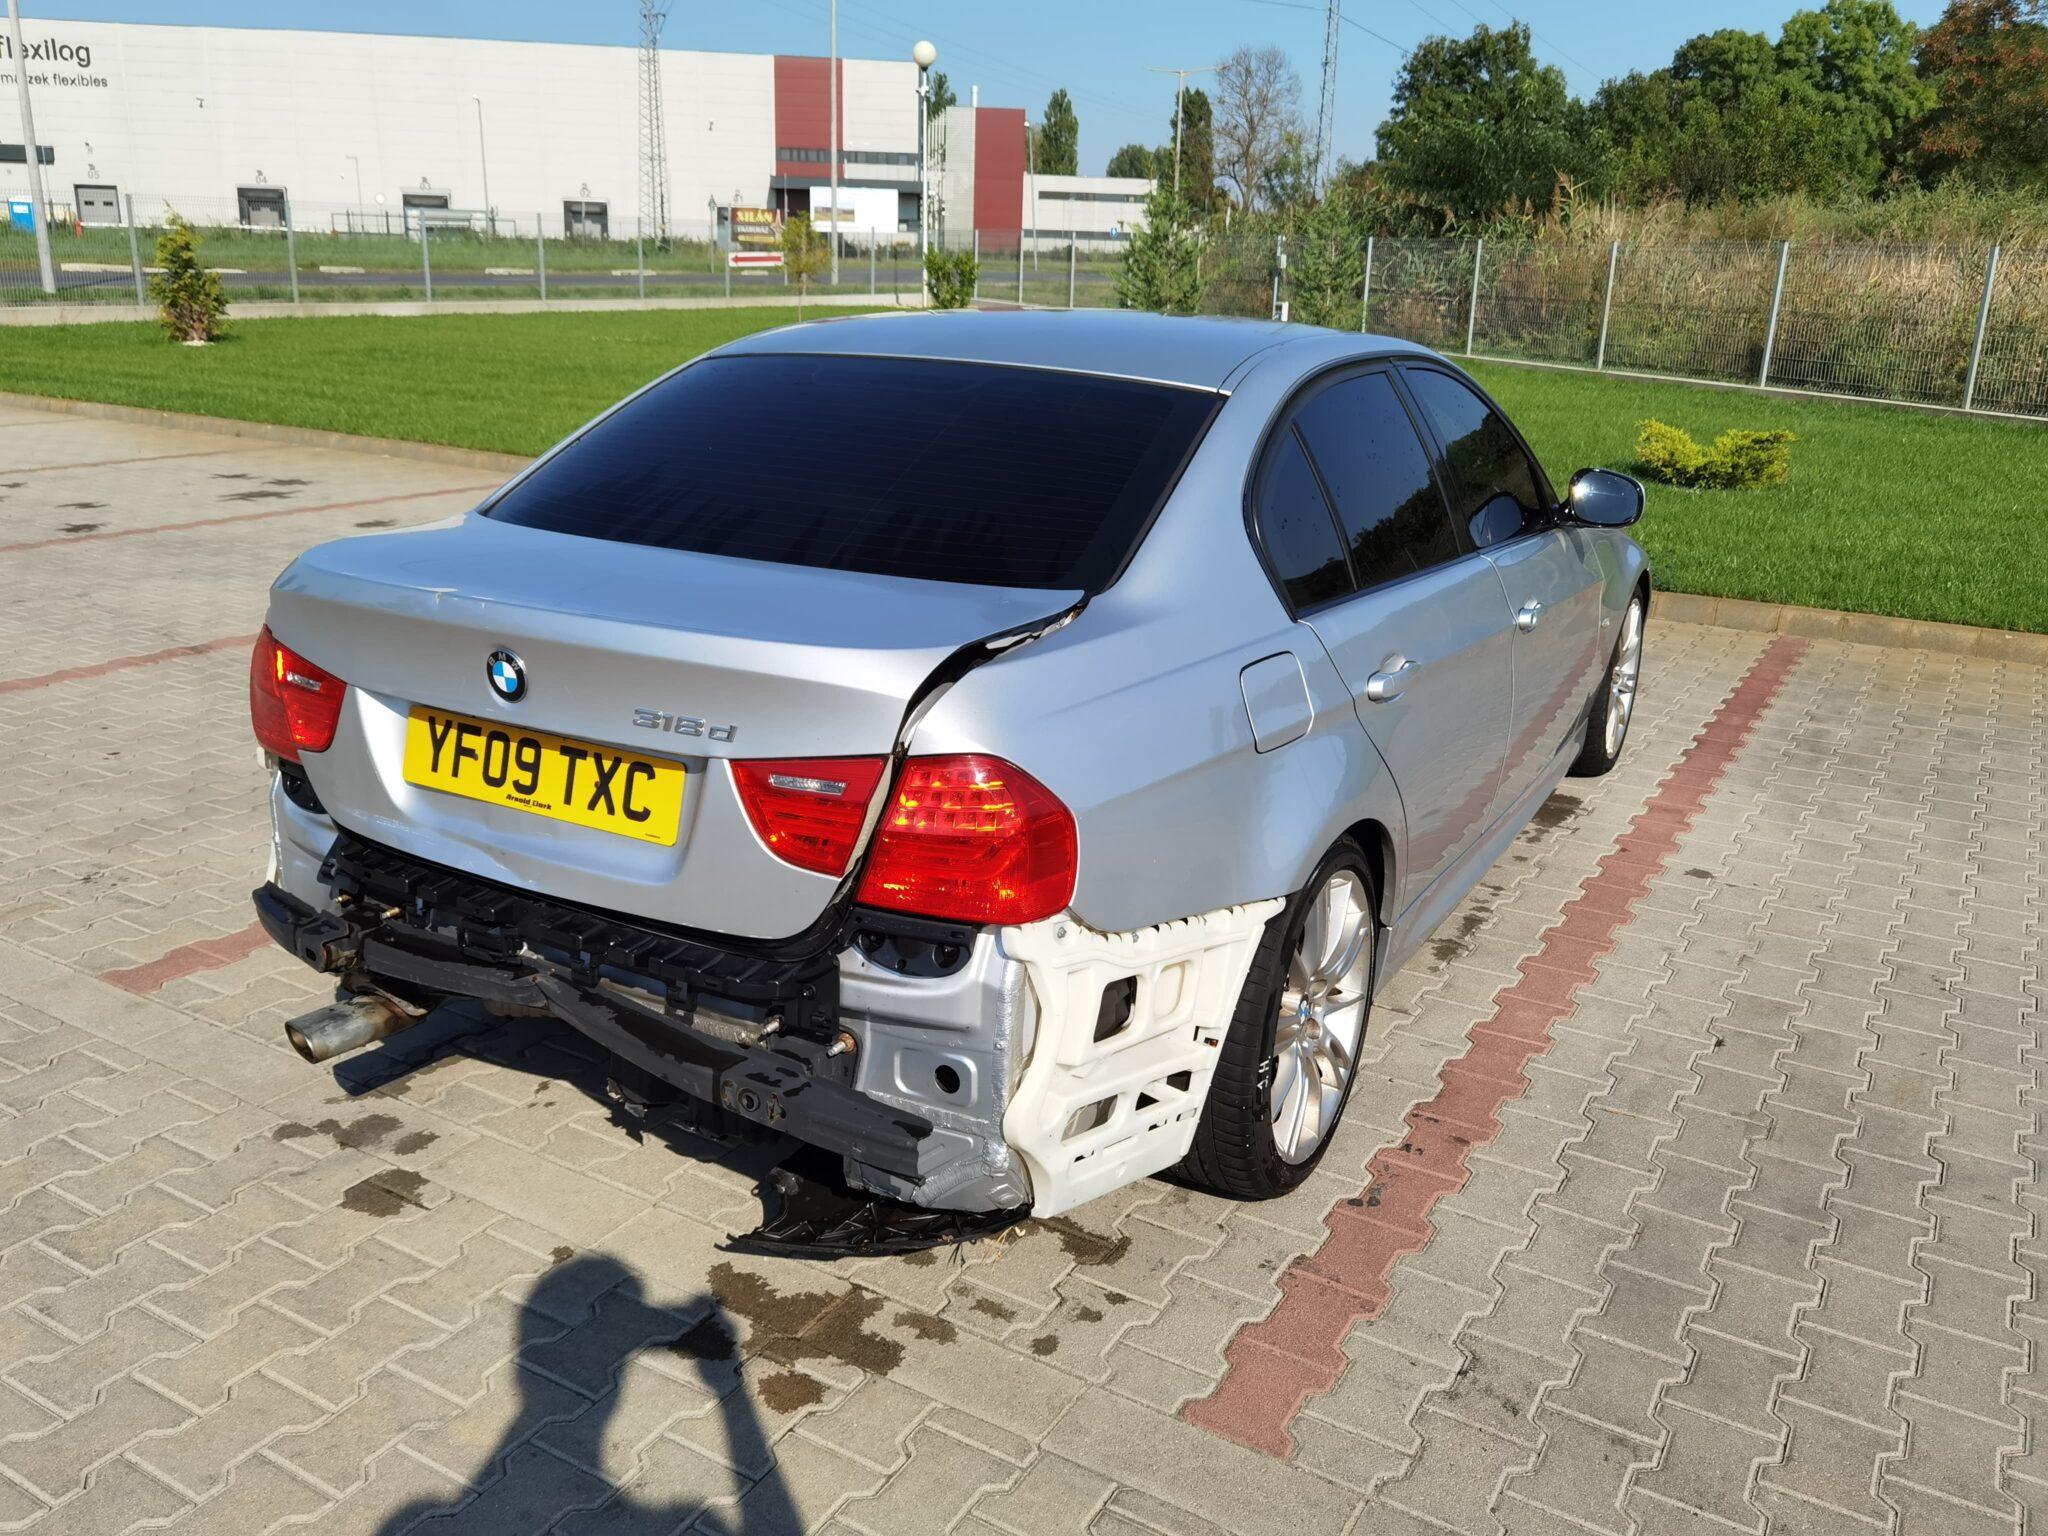 BMW E90 lci 318d Carbon Car Center Békéscsaba-7